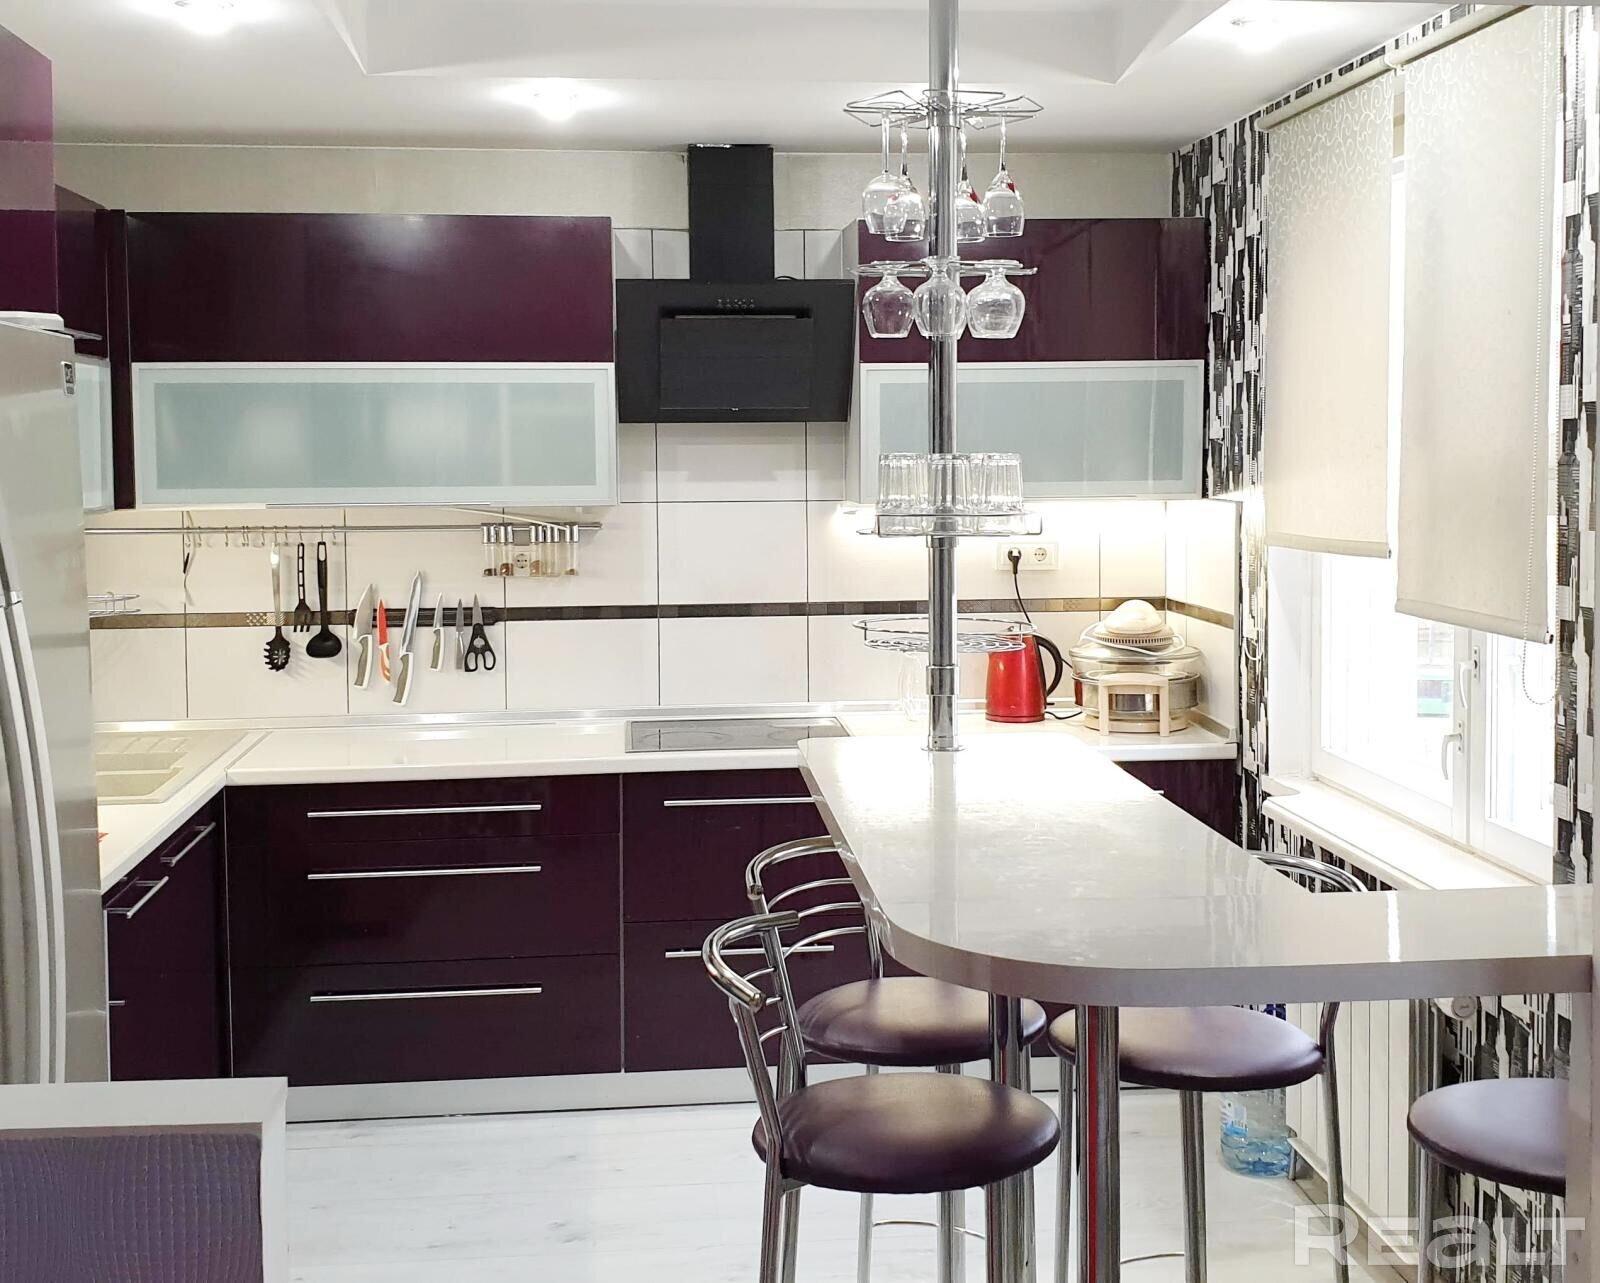 Продажа 3-х комнатной квартиры в г. Минске, ул. Матусевича, дом 52 (р-н Домбровка). Цена 241 980 руб